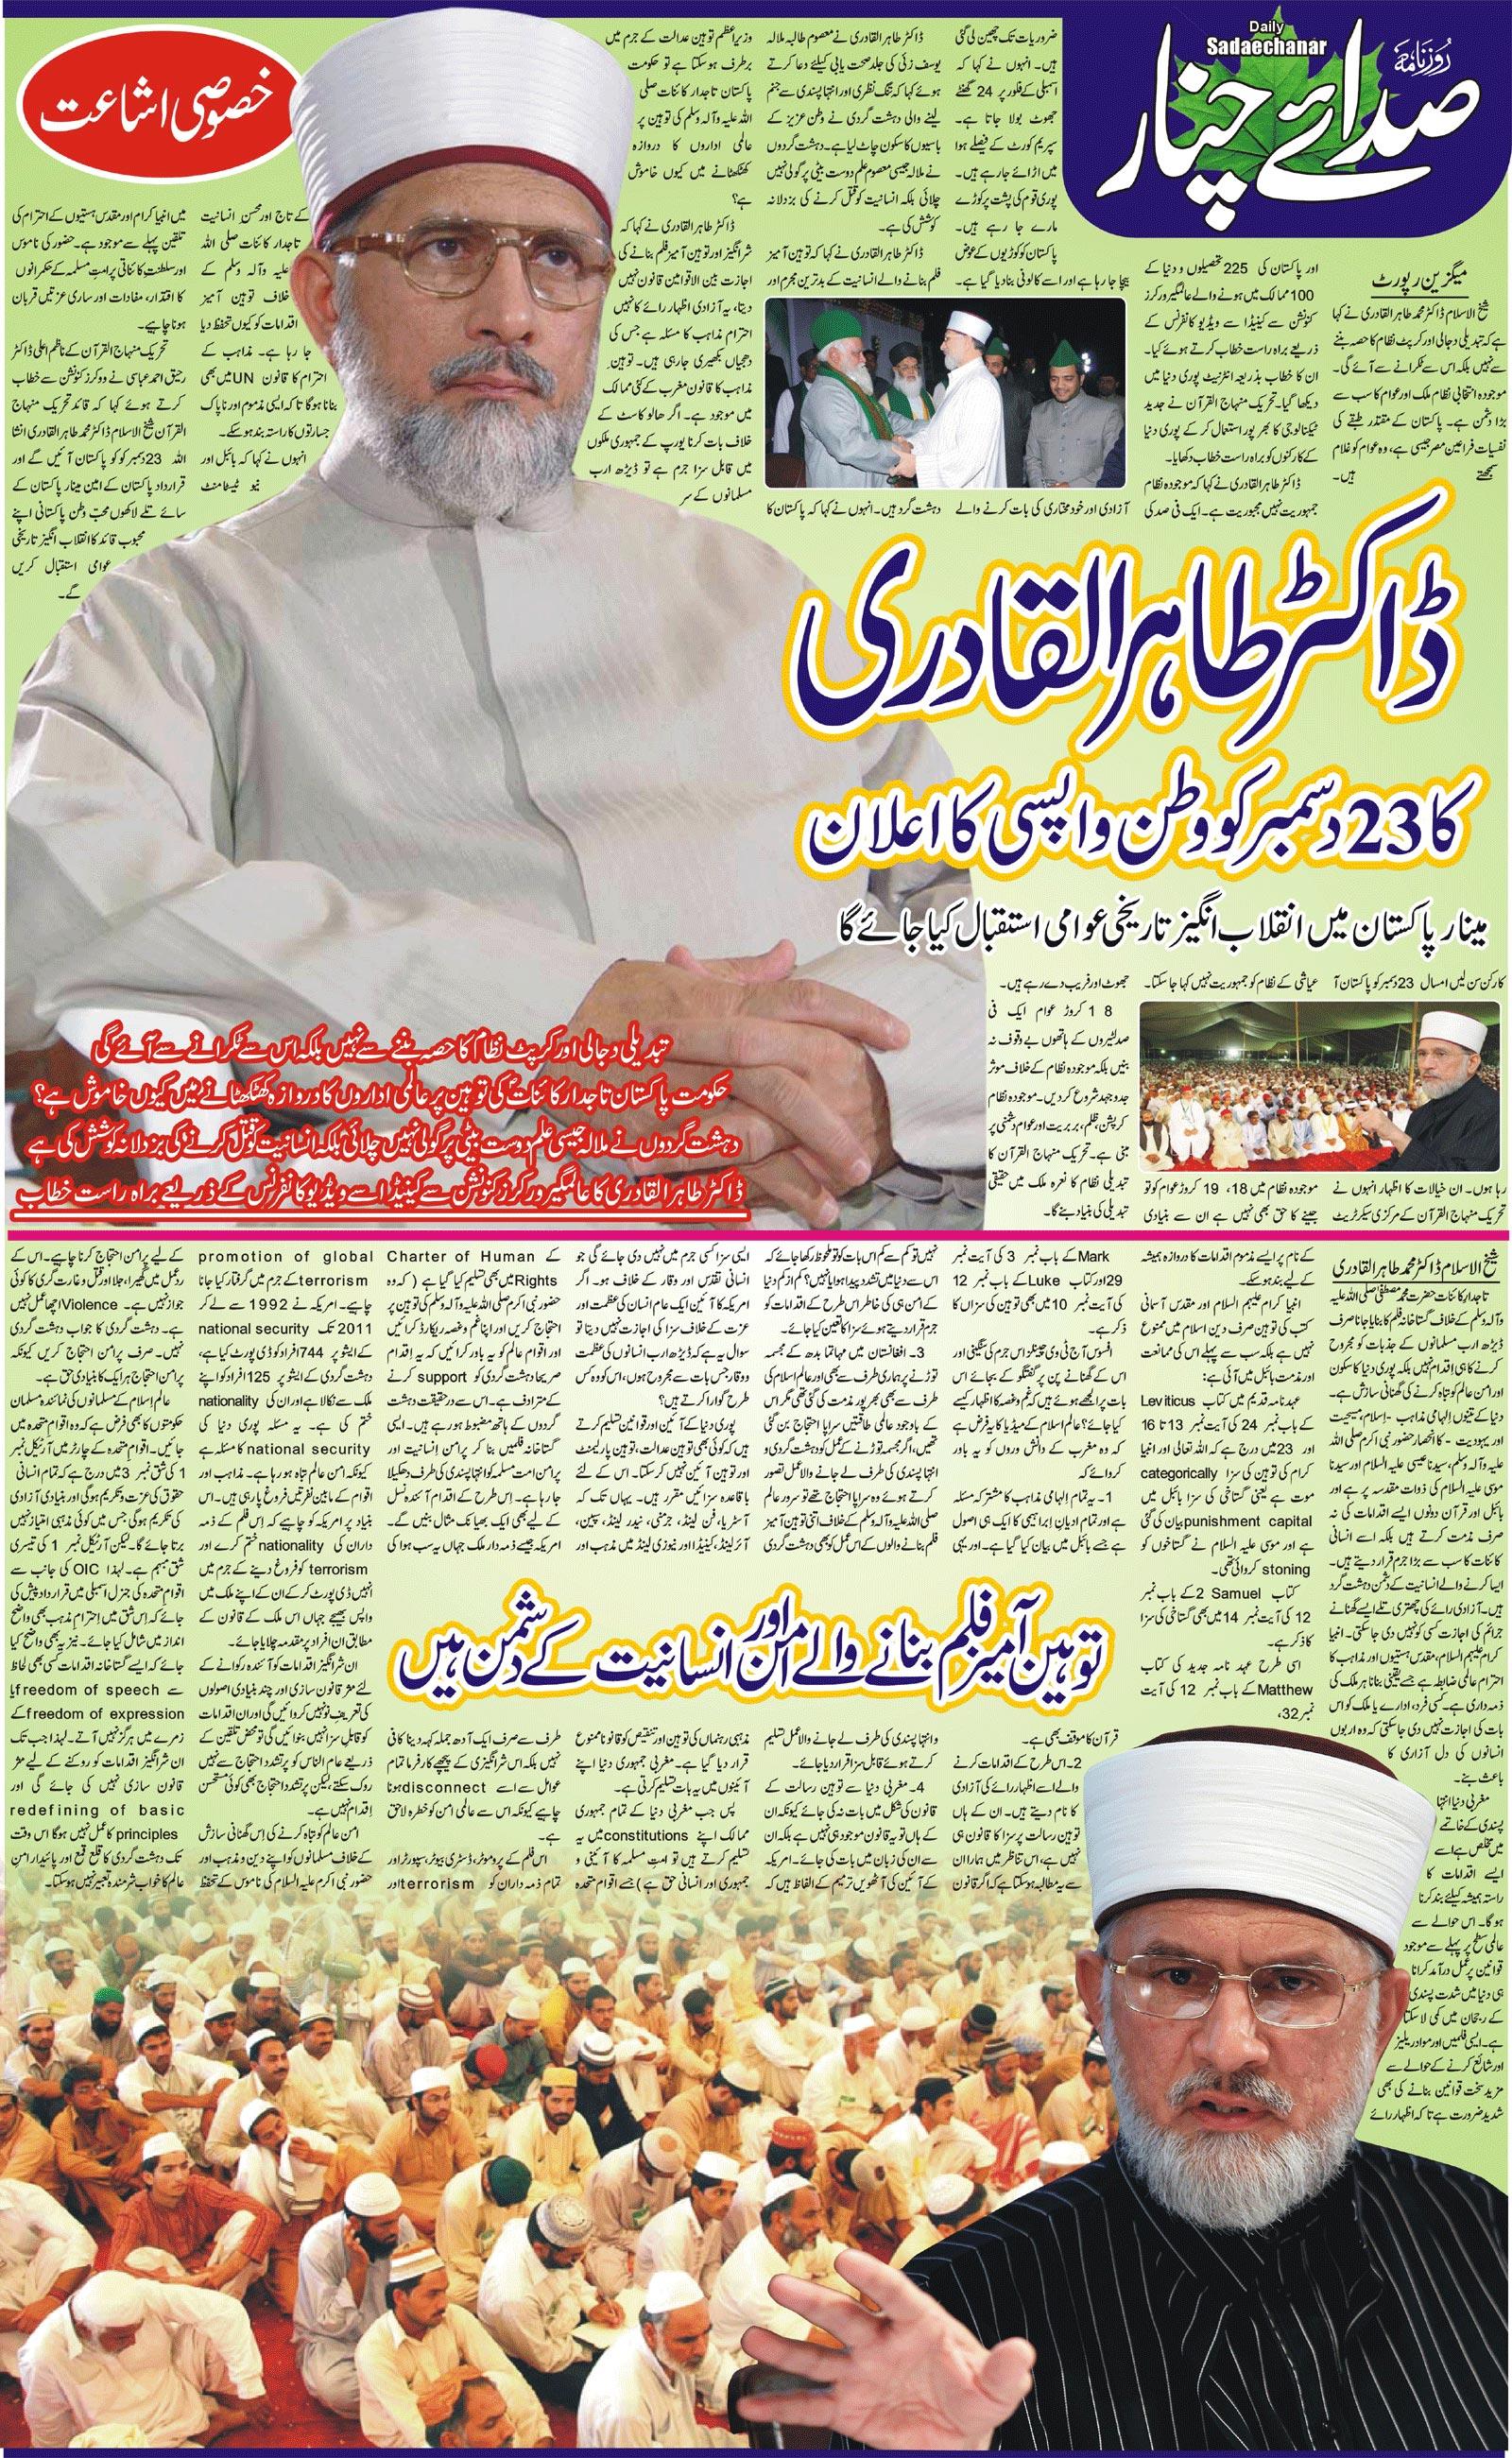 Mustafavi Student Movement Print Media Coverage Daily Sada e Chanar - Page: 5